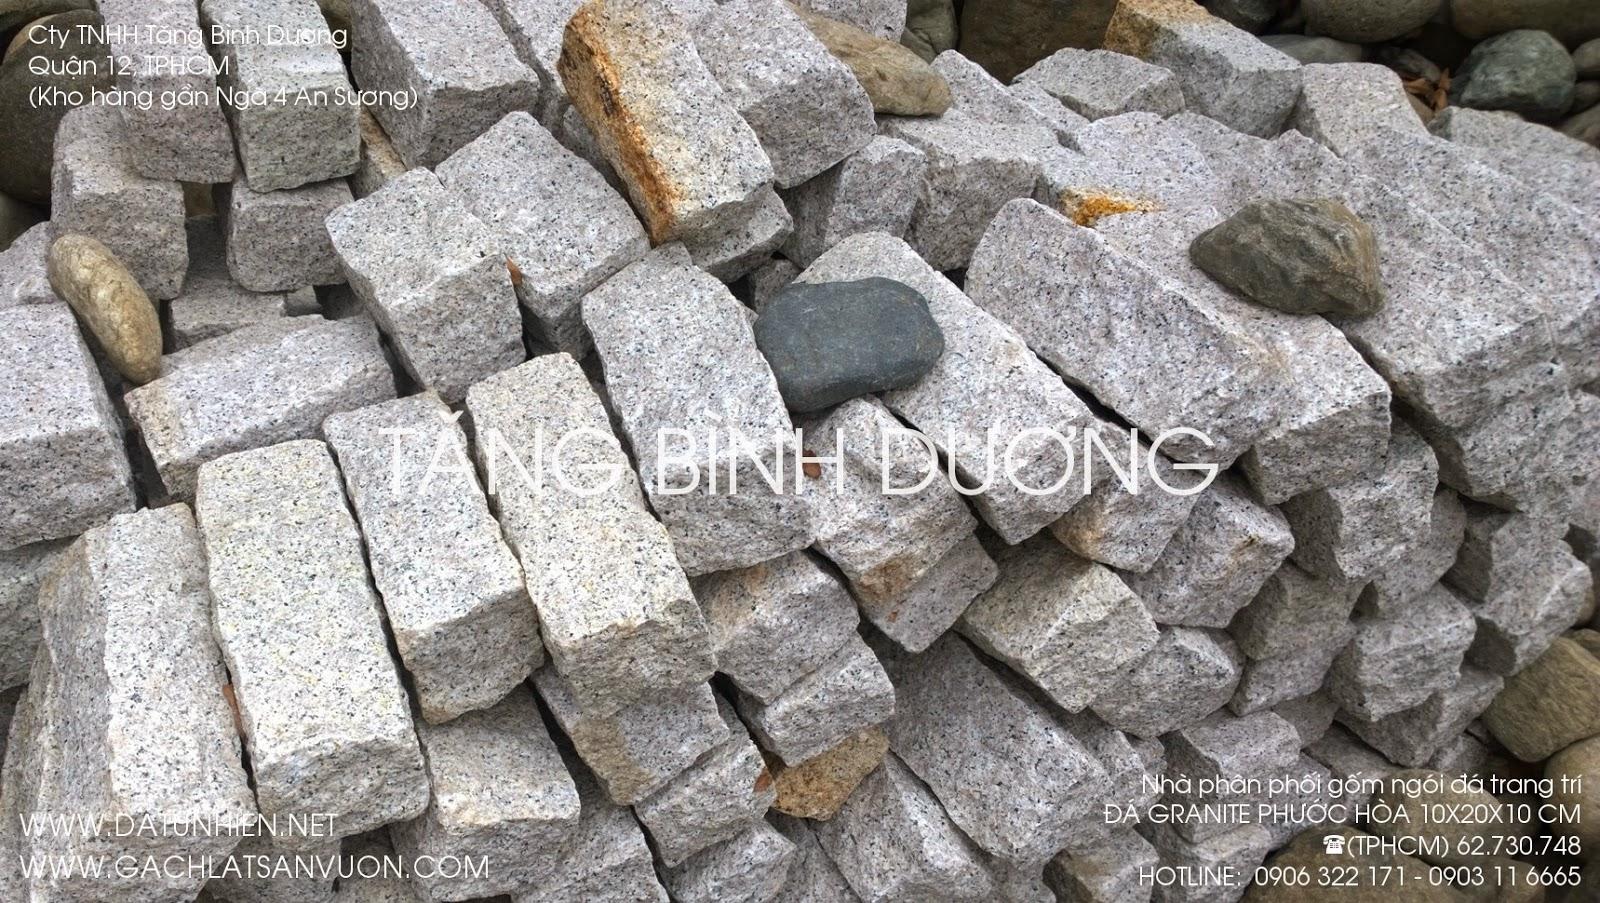 da granite phuoc hoa 10x20x10 cm